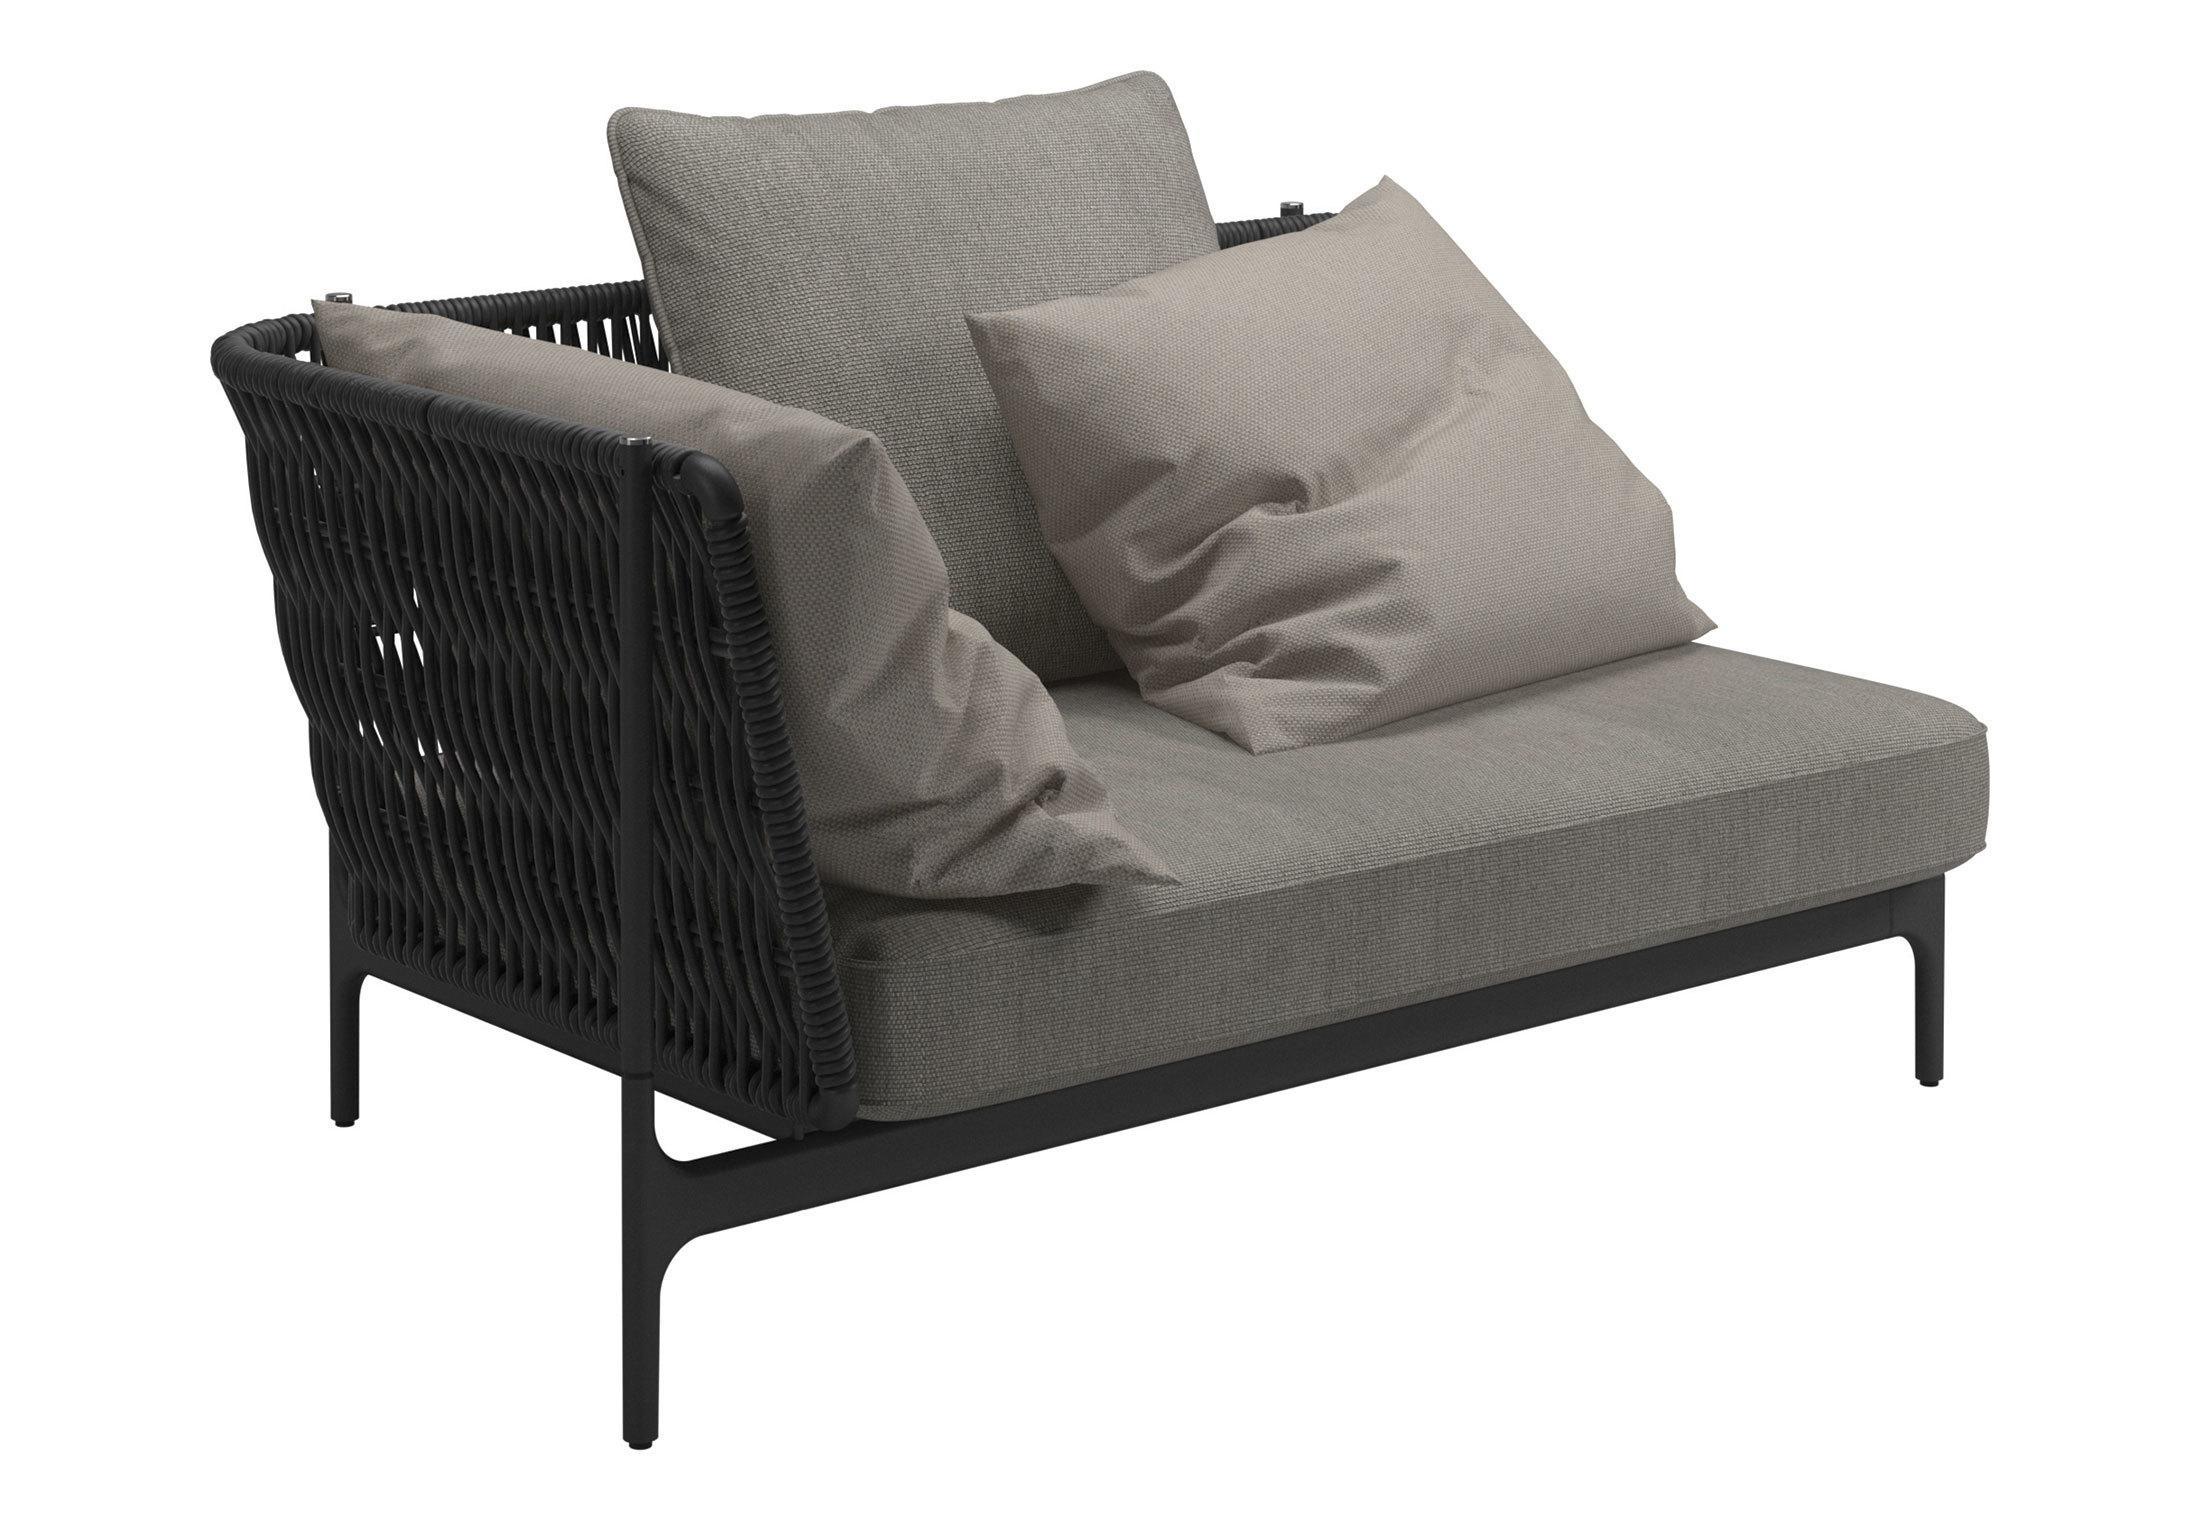 Grand Weave Left Corner Unitgloster Furniture   Stylepark In Sofa Corner Units (Image 11 of 24)